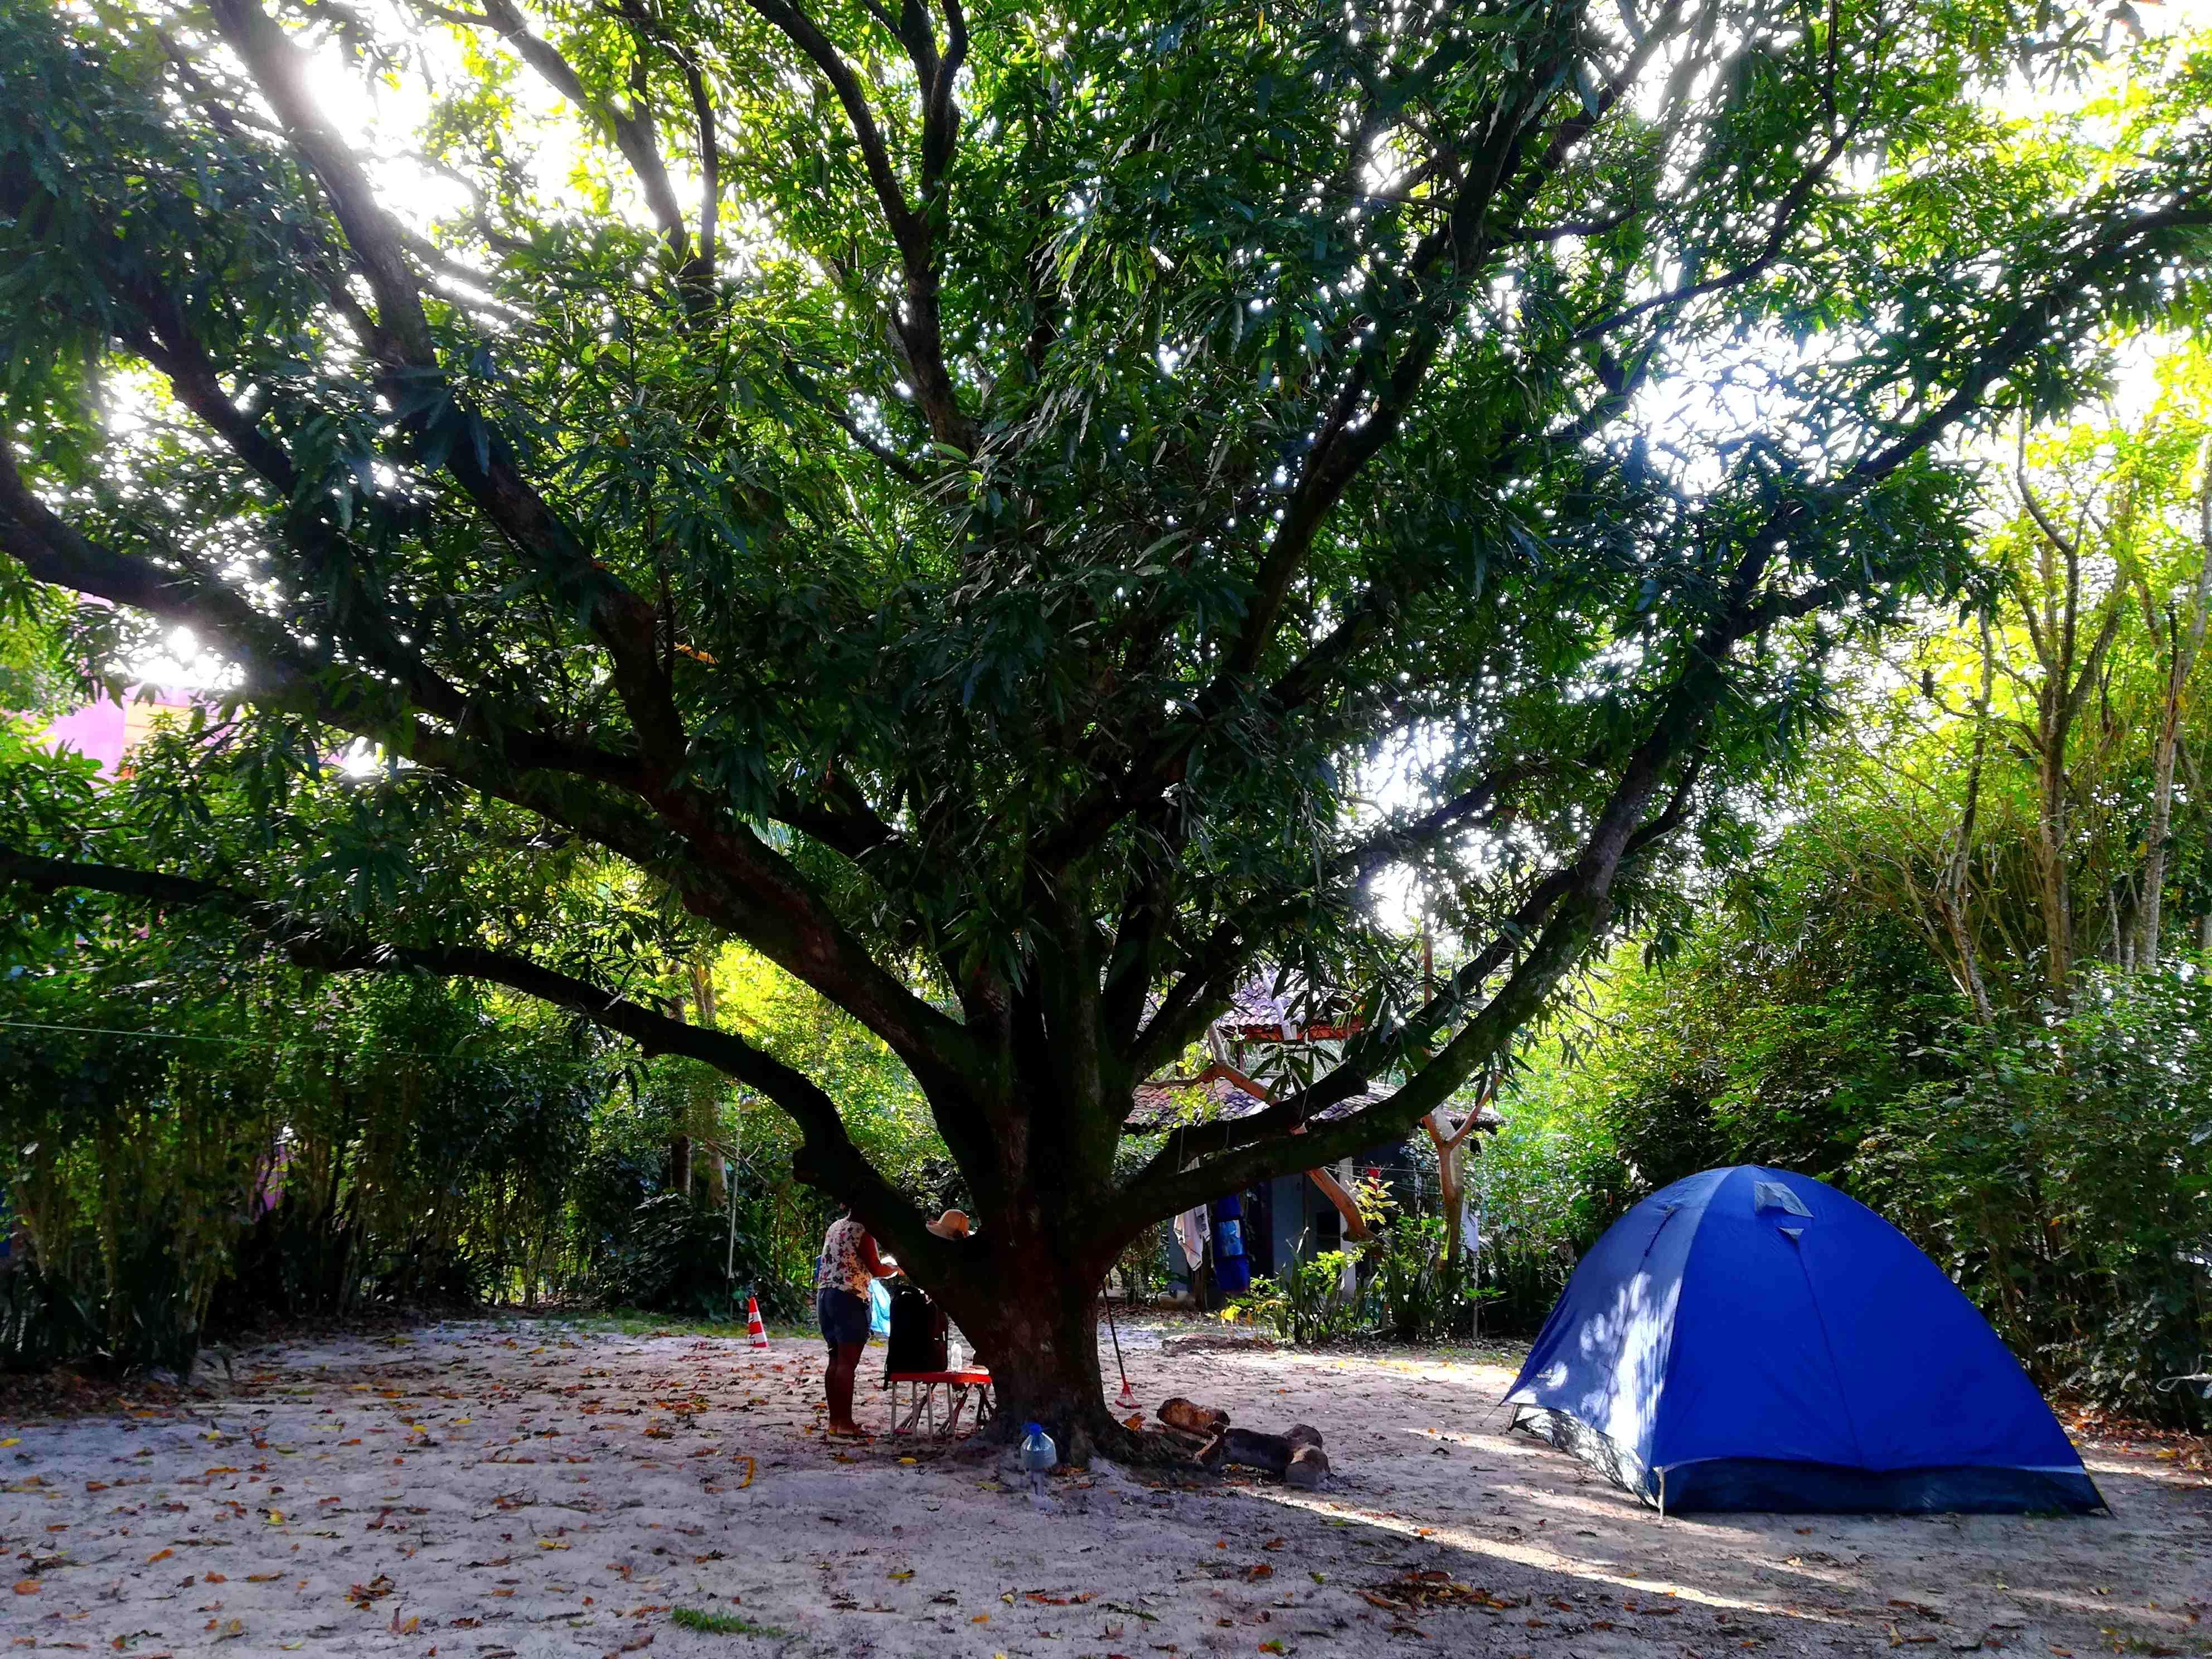 camping tendal diogo bahia